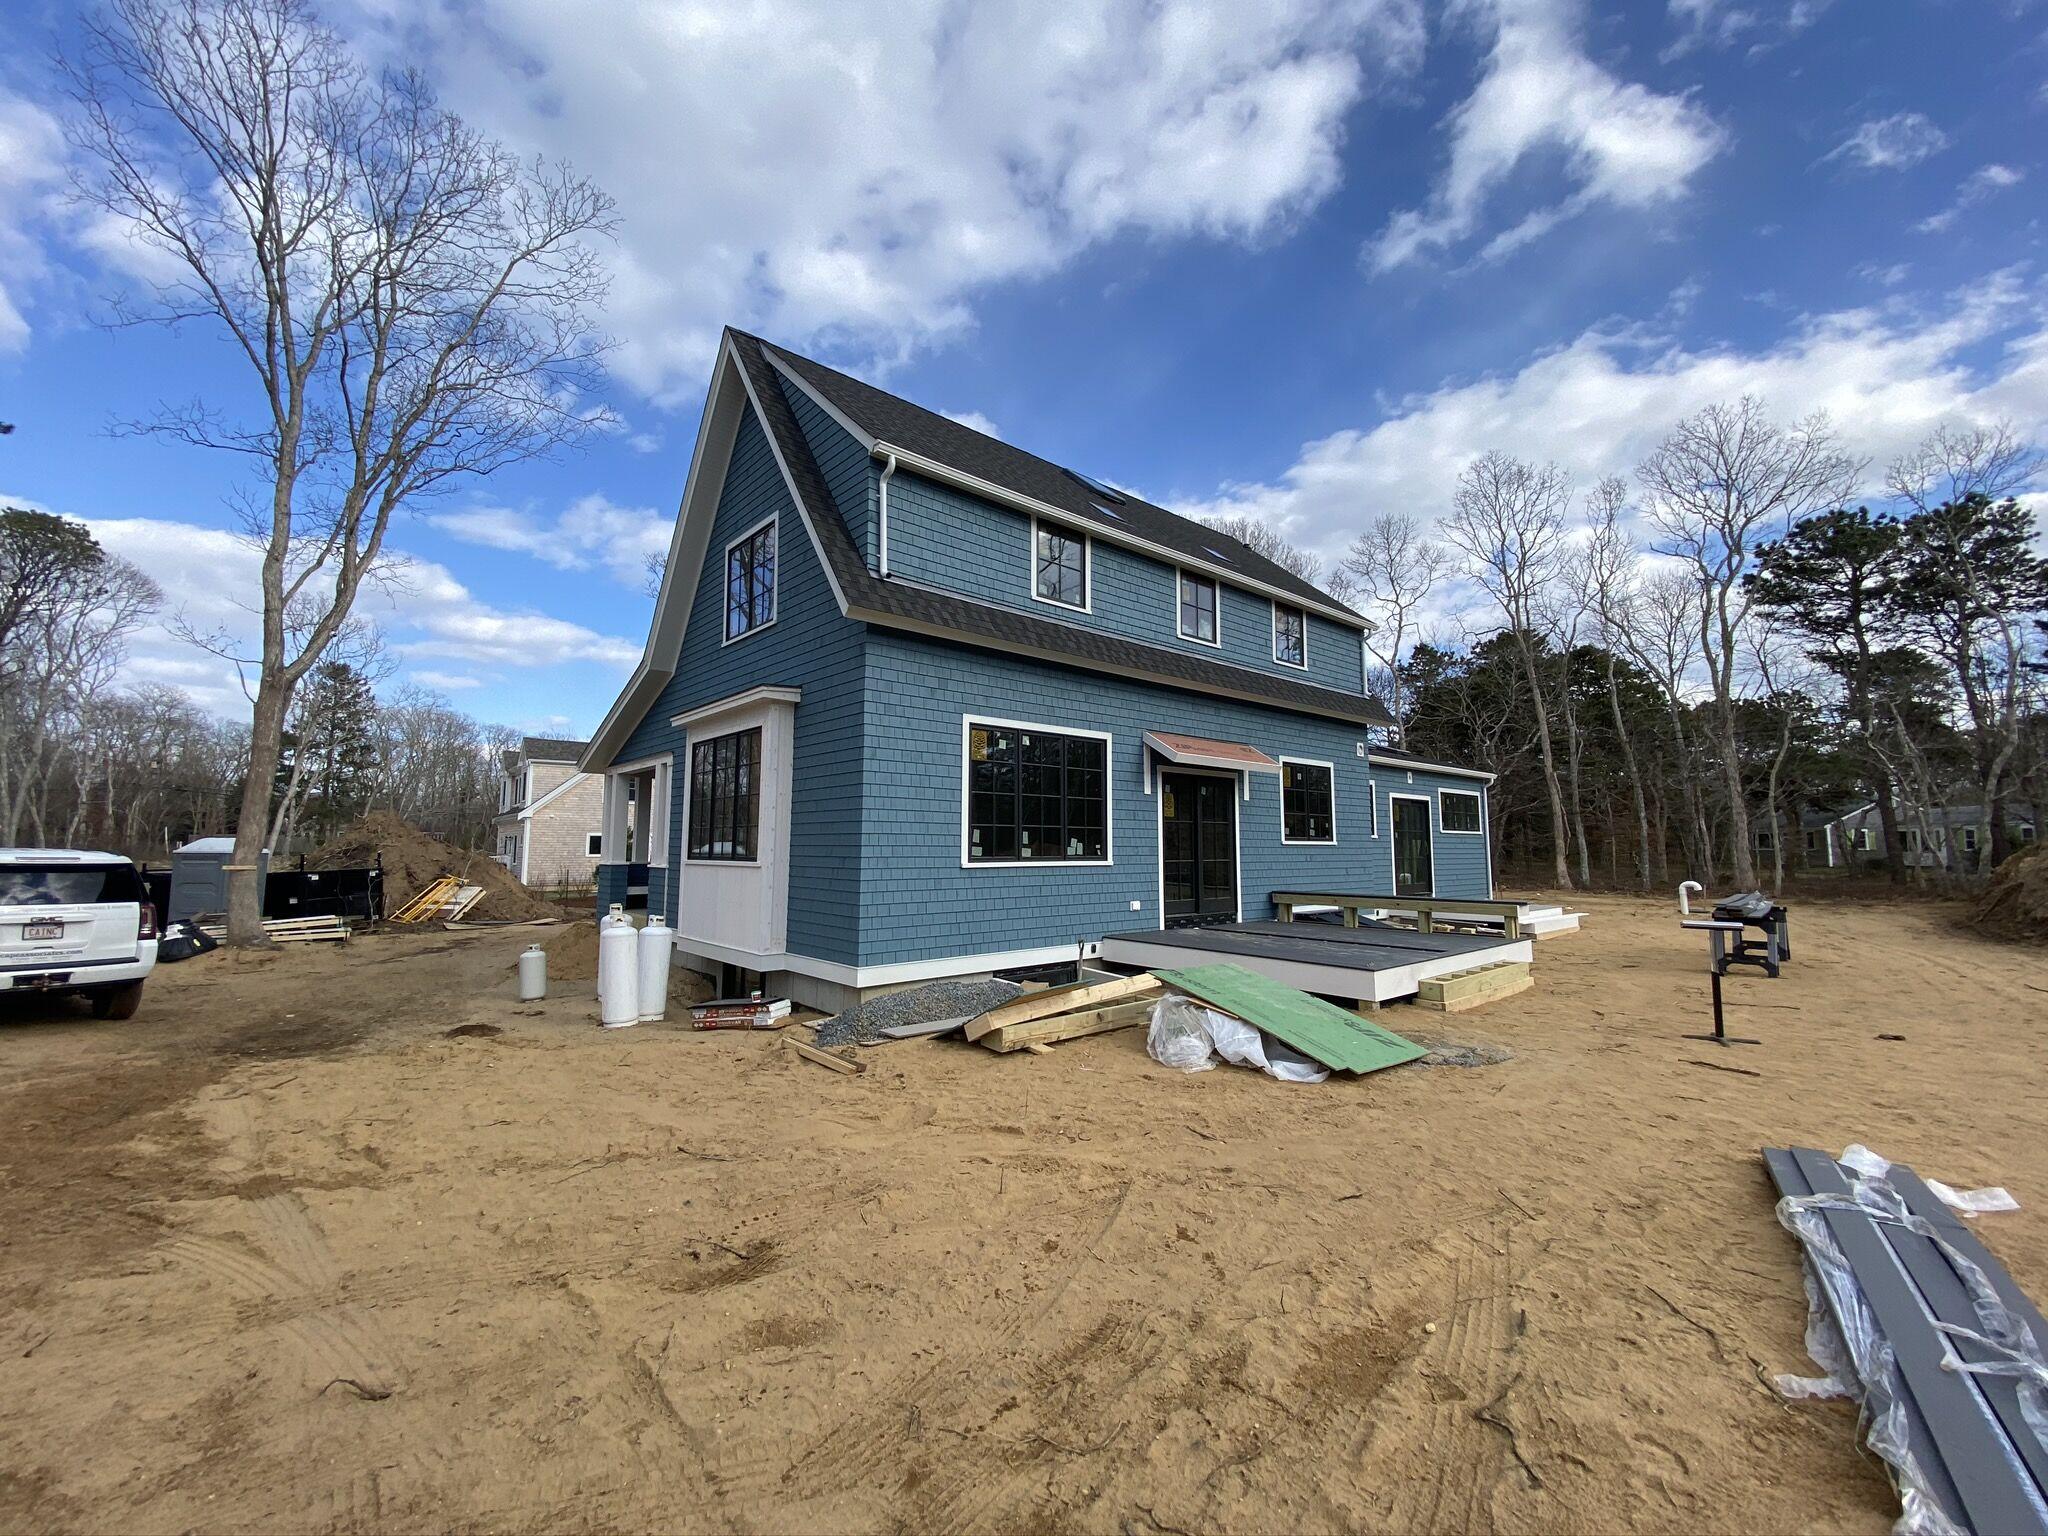 Cottage on the Cape, Idea House, 2020, Progress